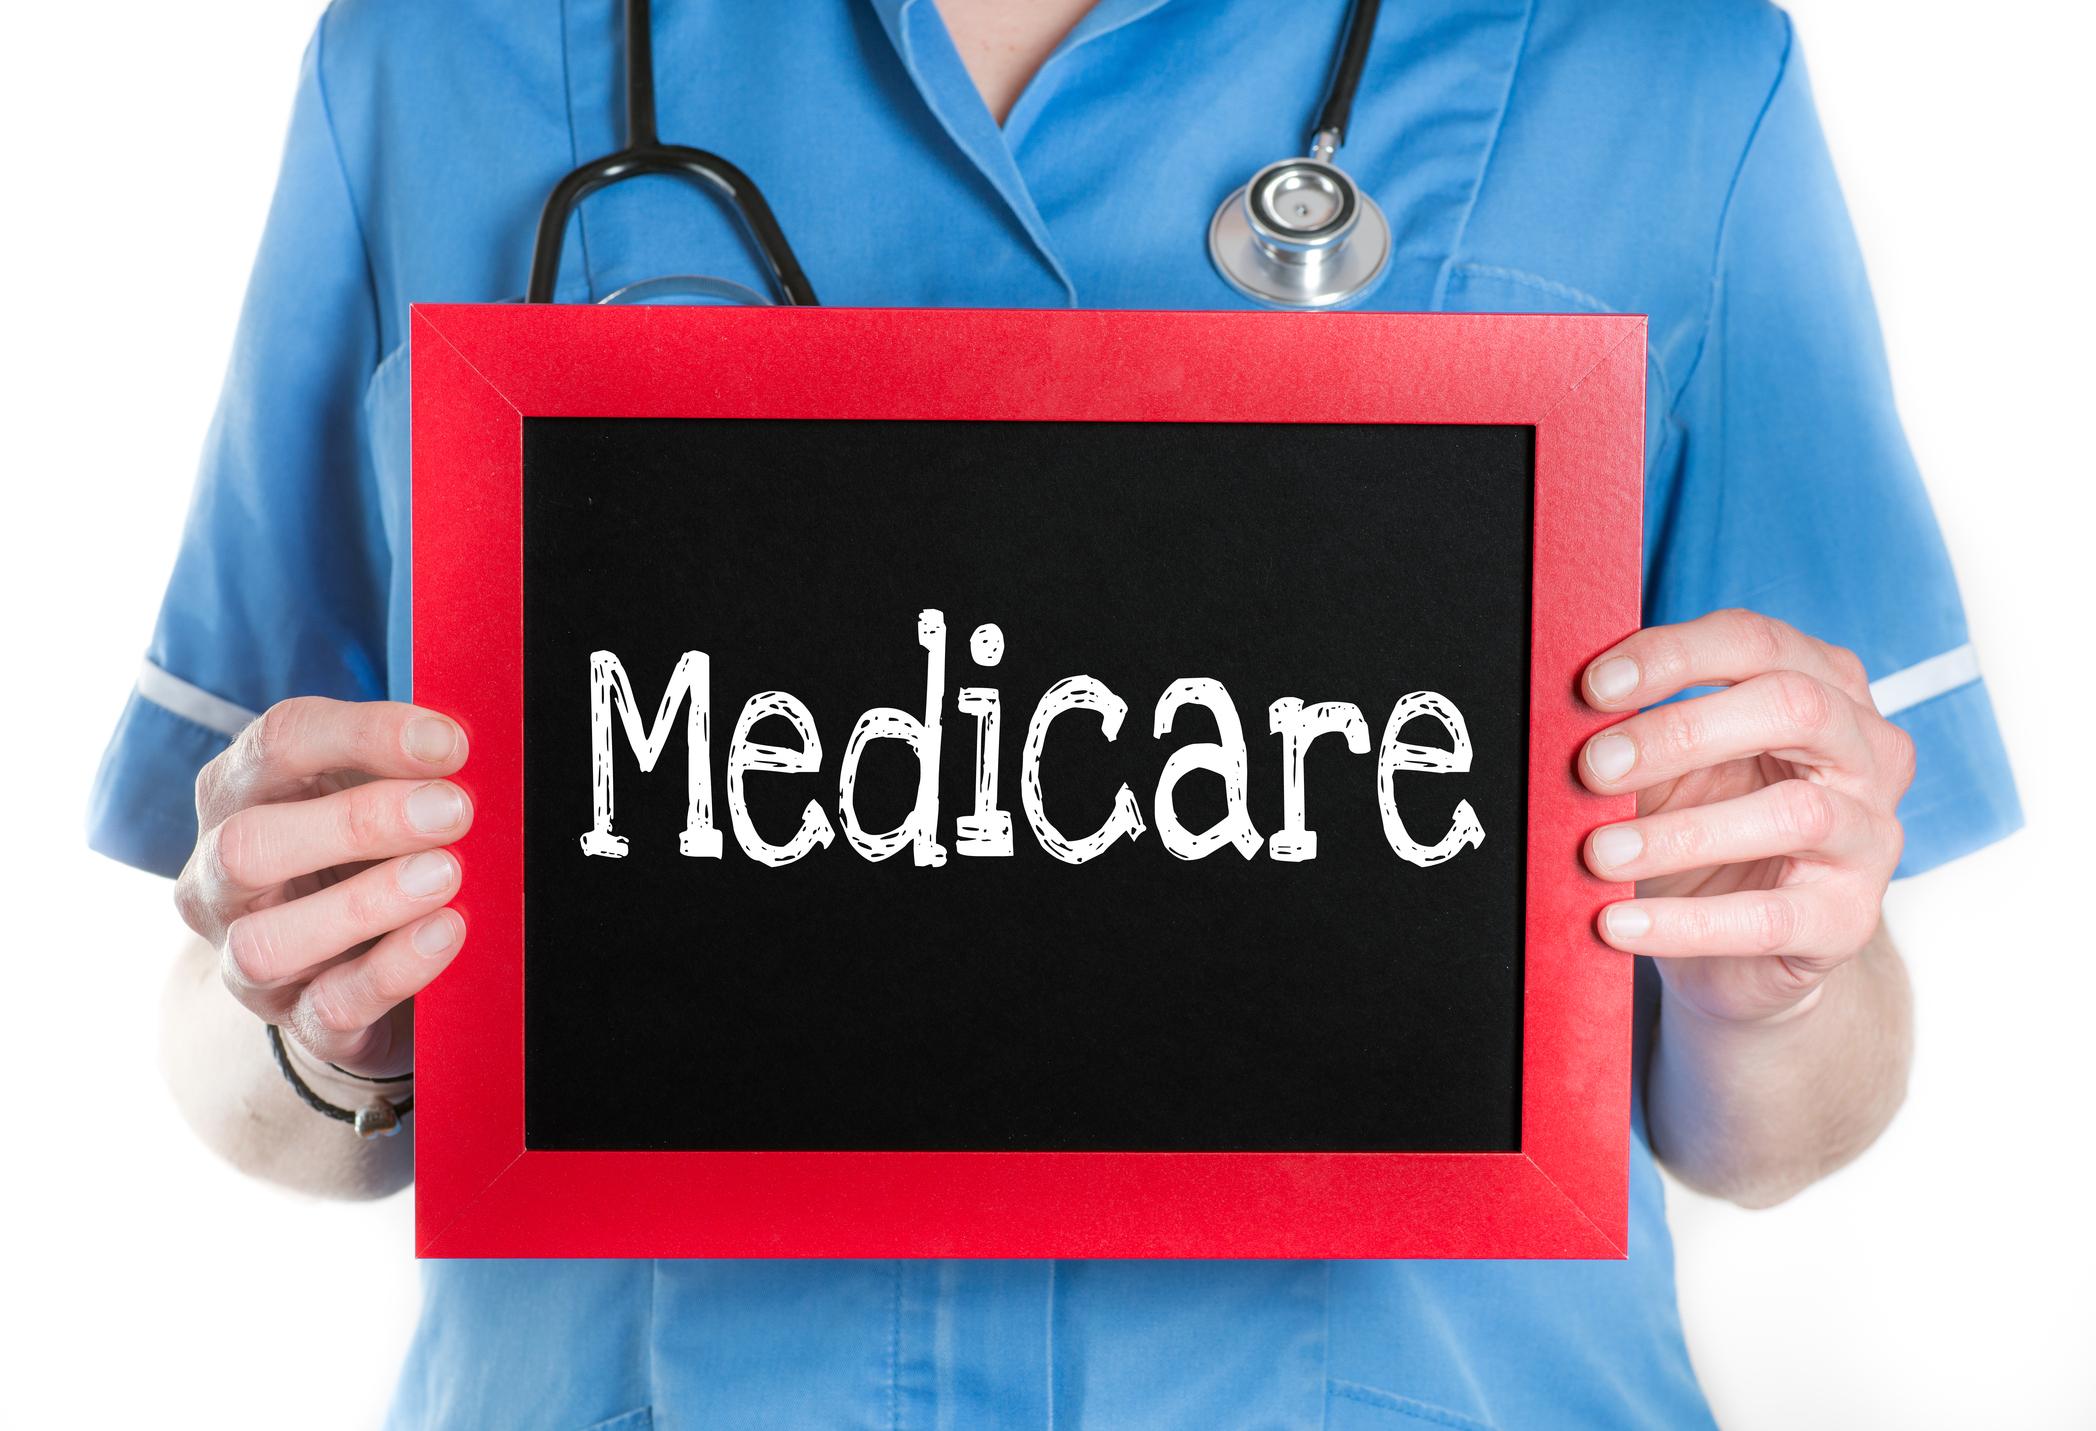 Let's talk about Medicare 101!